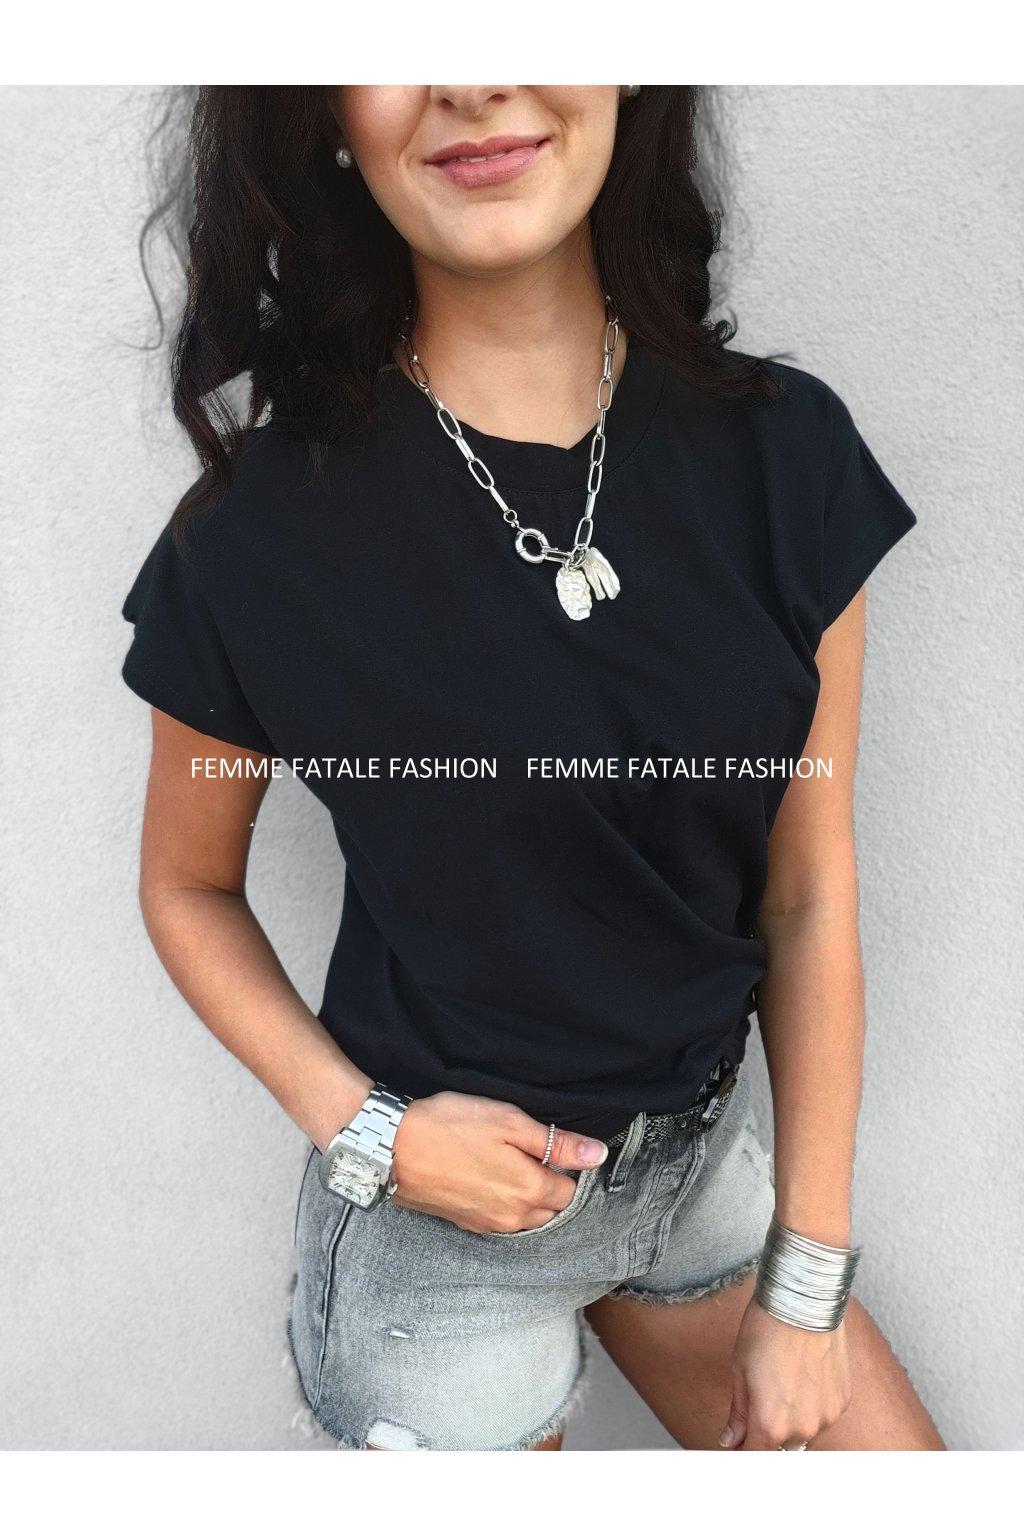 Tričko BASIC femmefatalefashion.cz